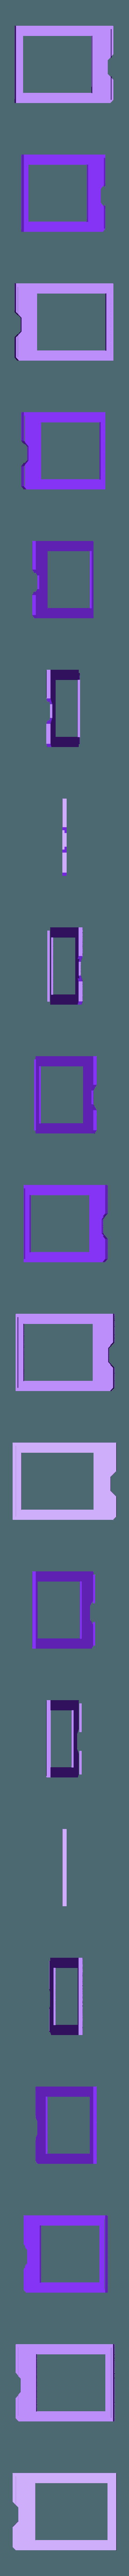 pymic-bezel.stl Download free STL file PyBadge Case with Flip Out Mic (TensorFlow Lite Kit) • Template to 3D print, Adafruit